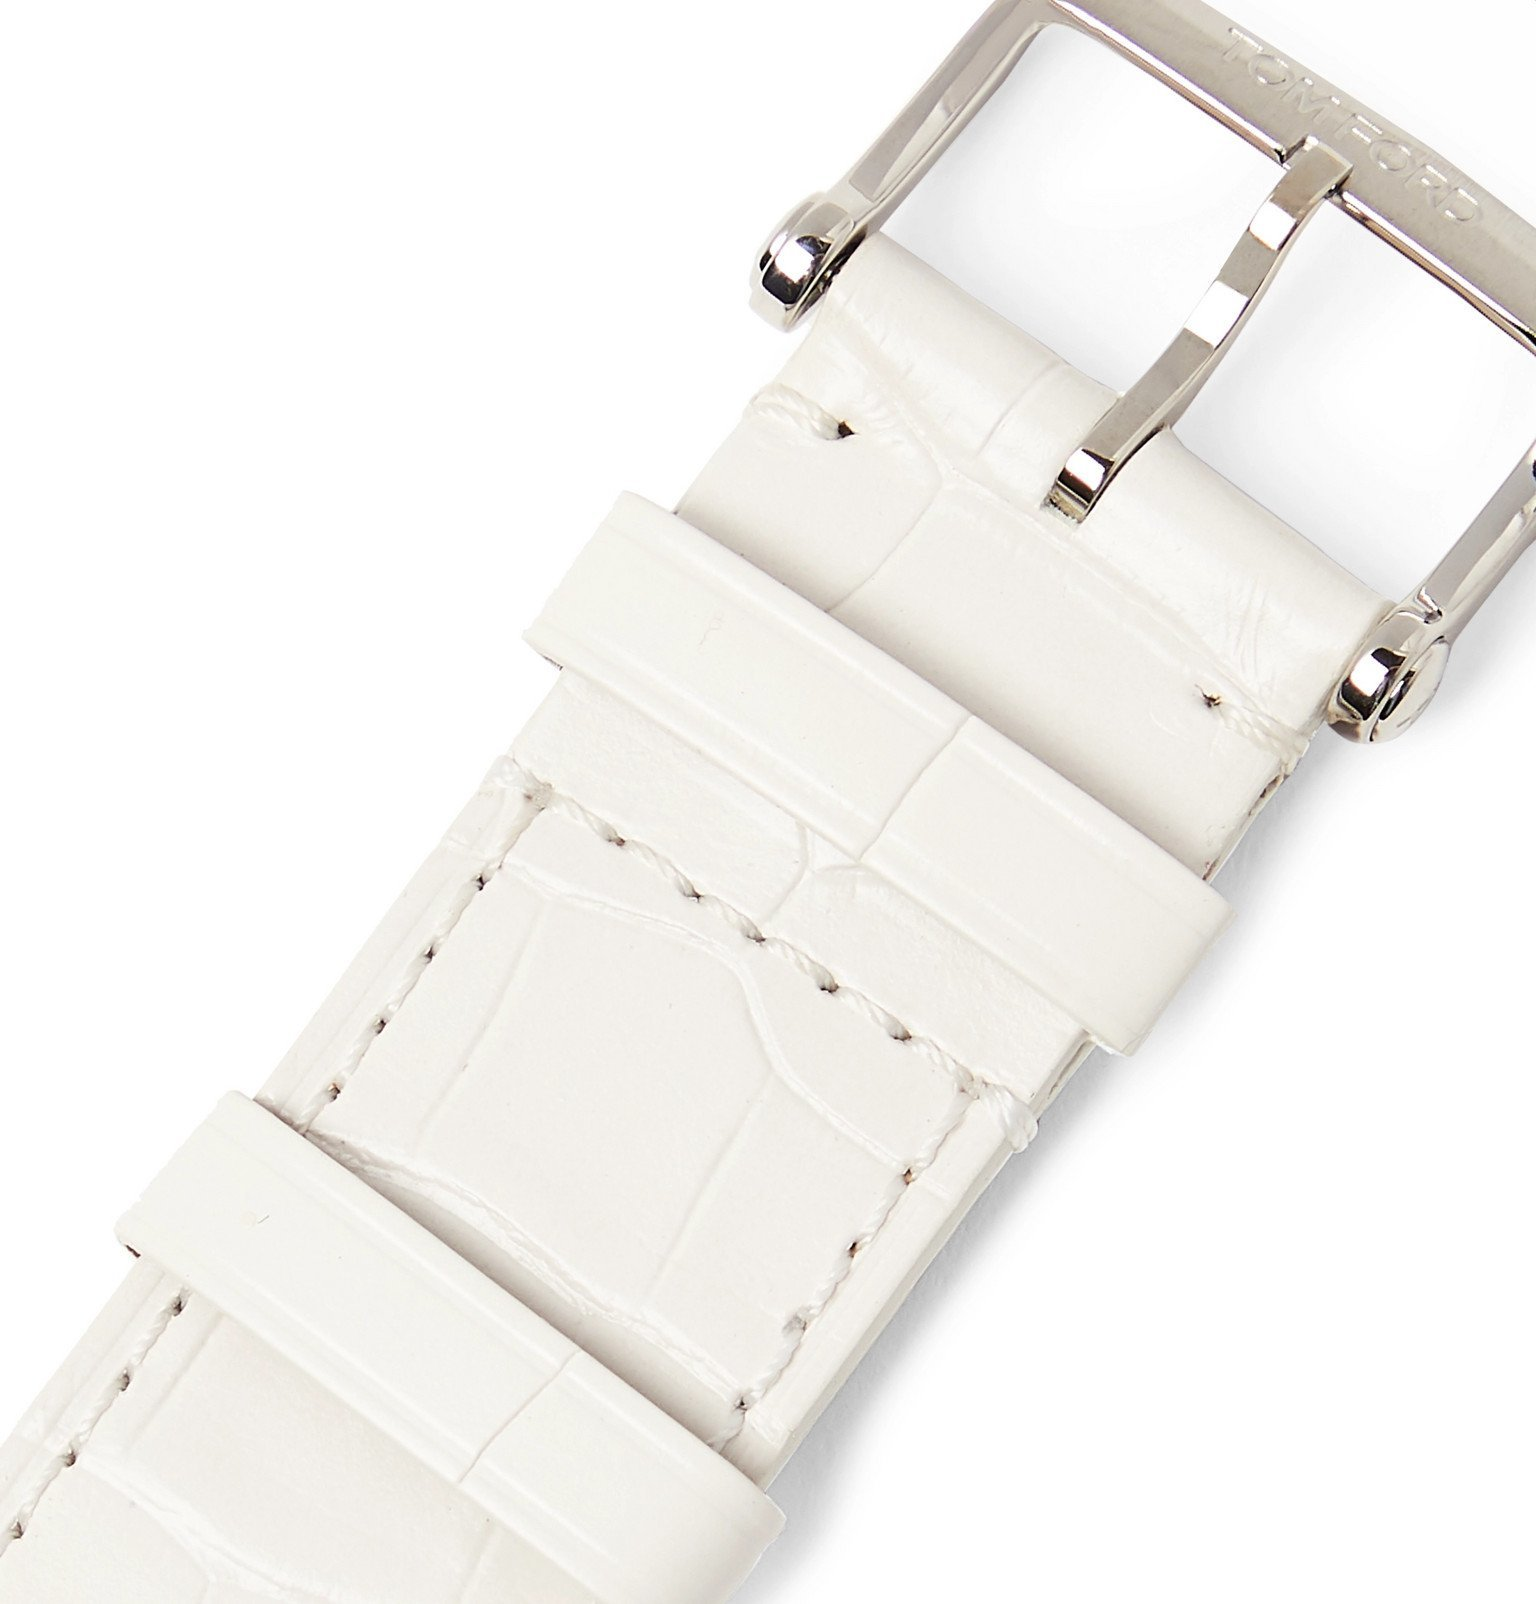 Tom Ford Timepieces - Alligator Watch Strap - White